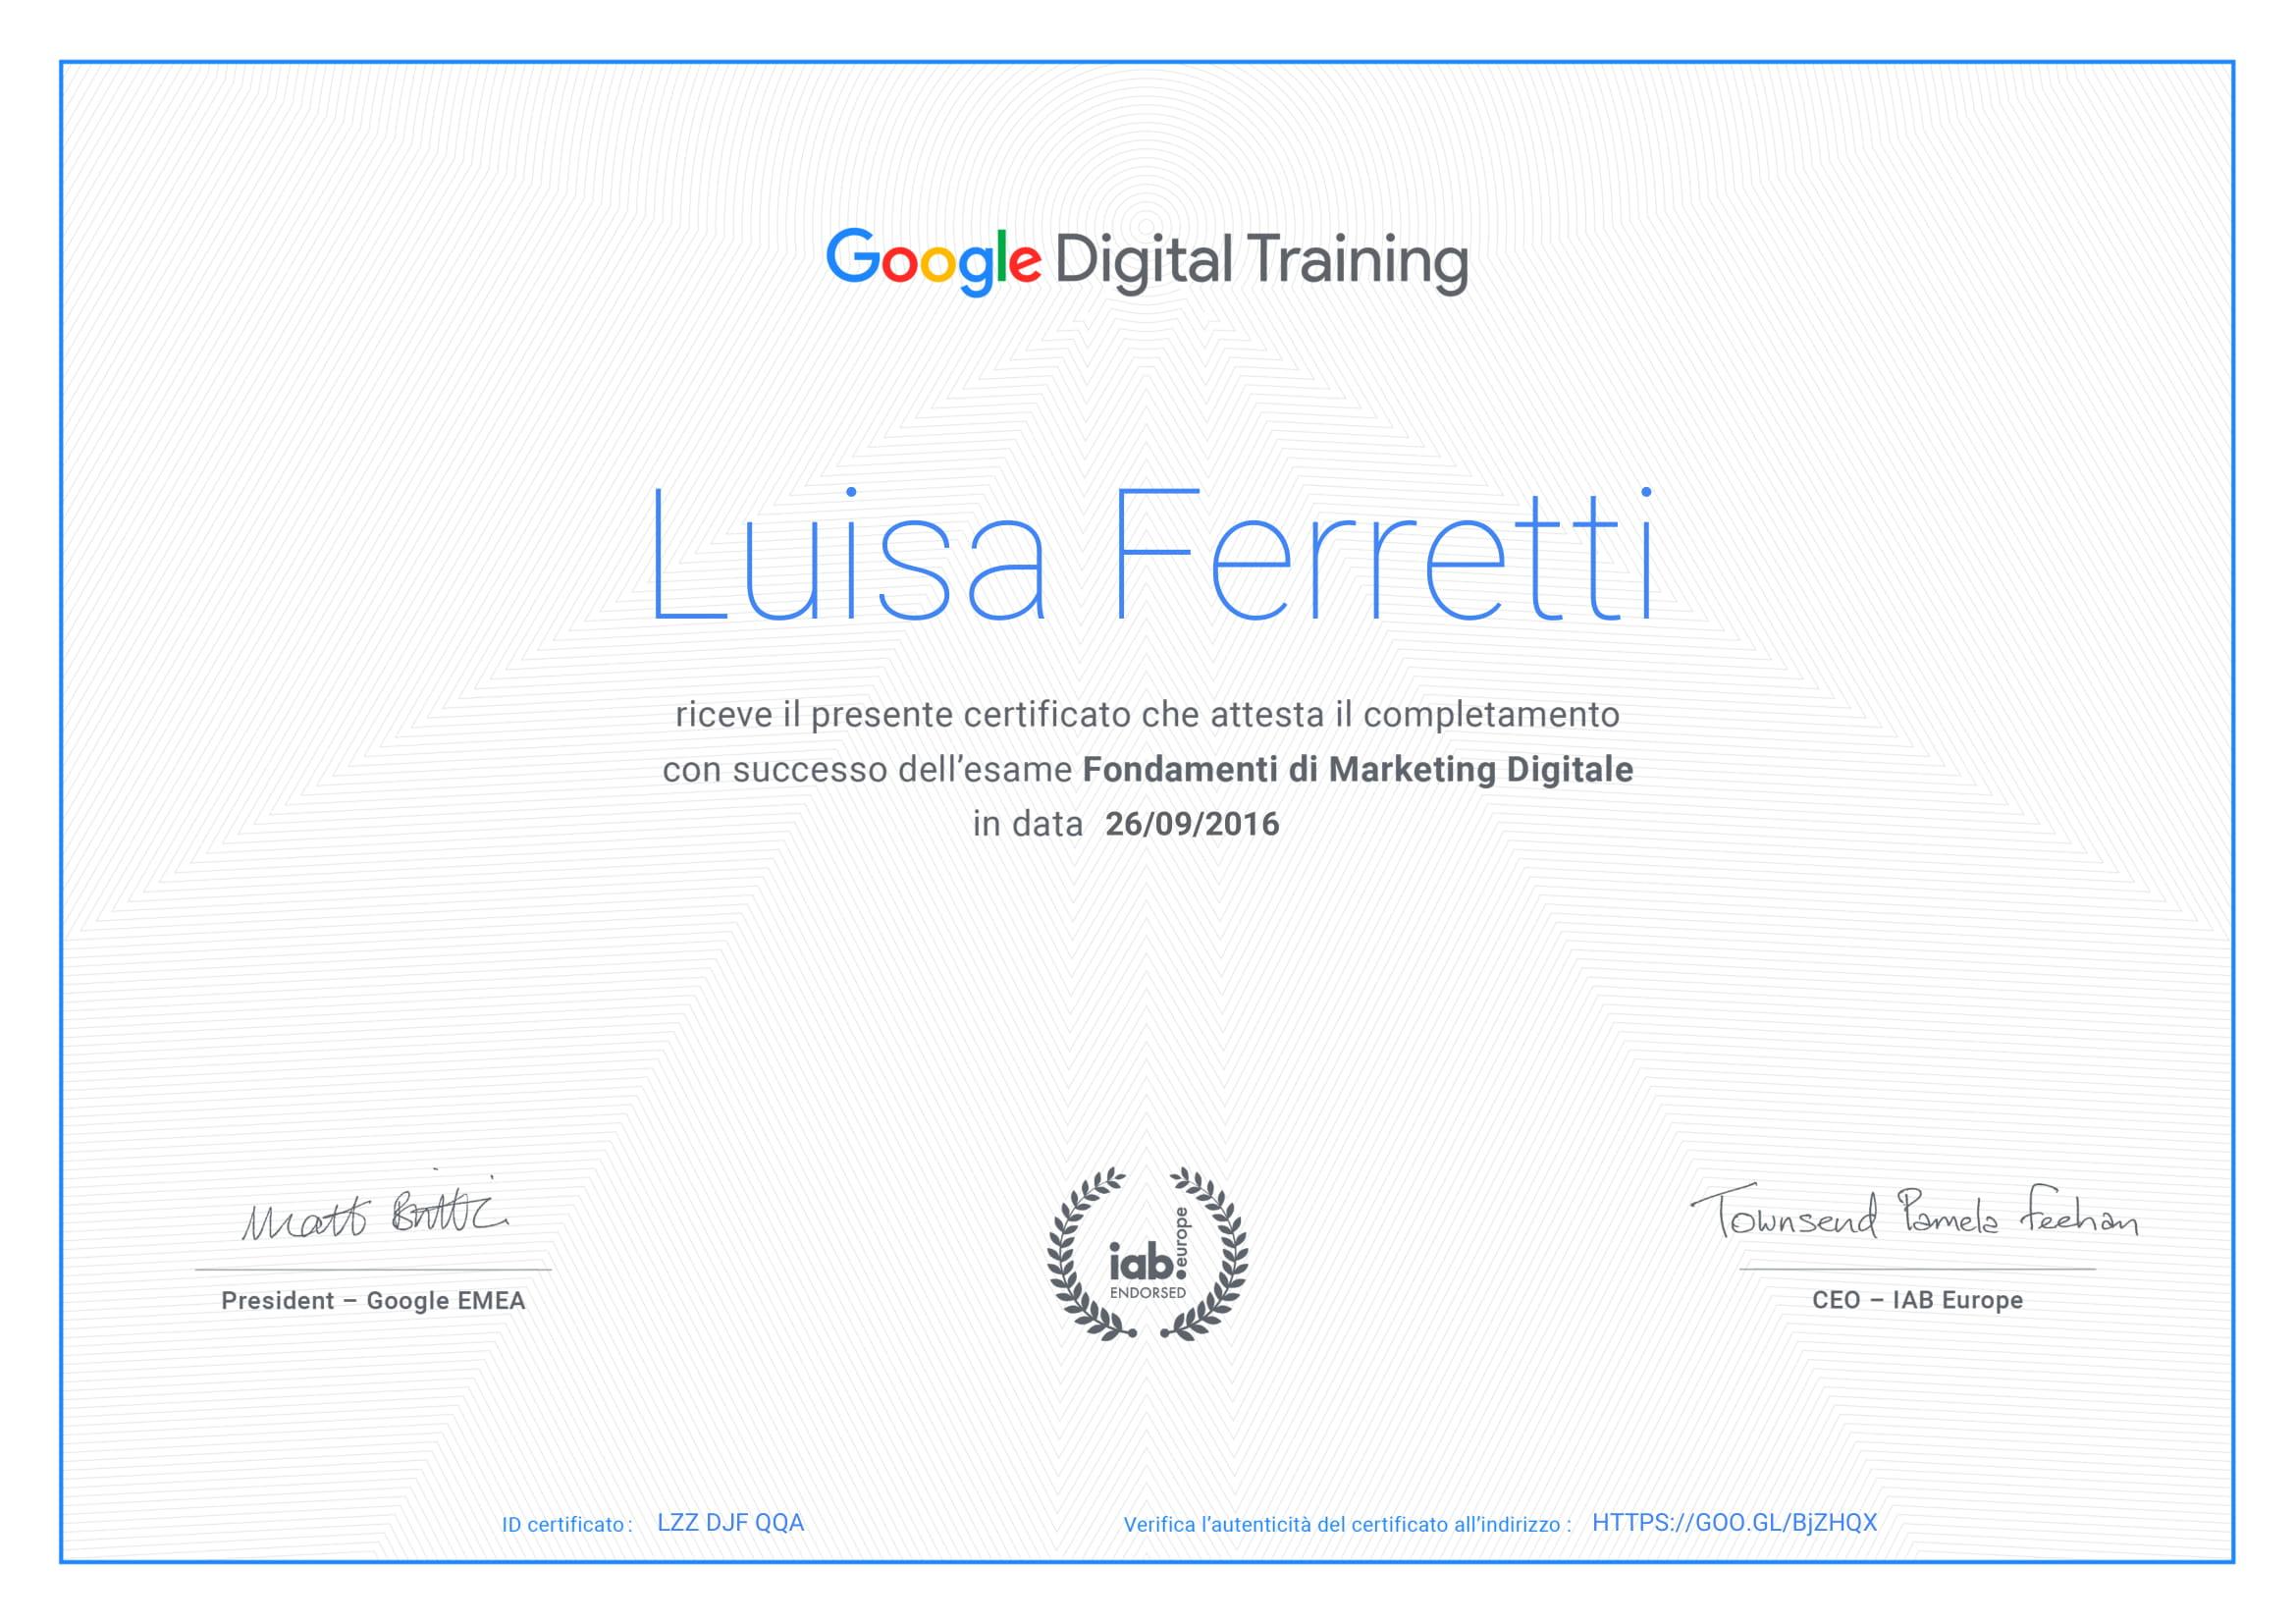 https://learndigital.withgoogle.com/digitaltraining